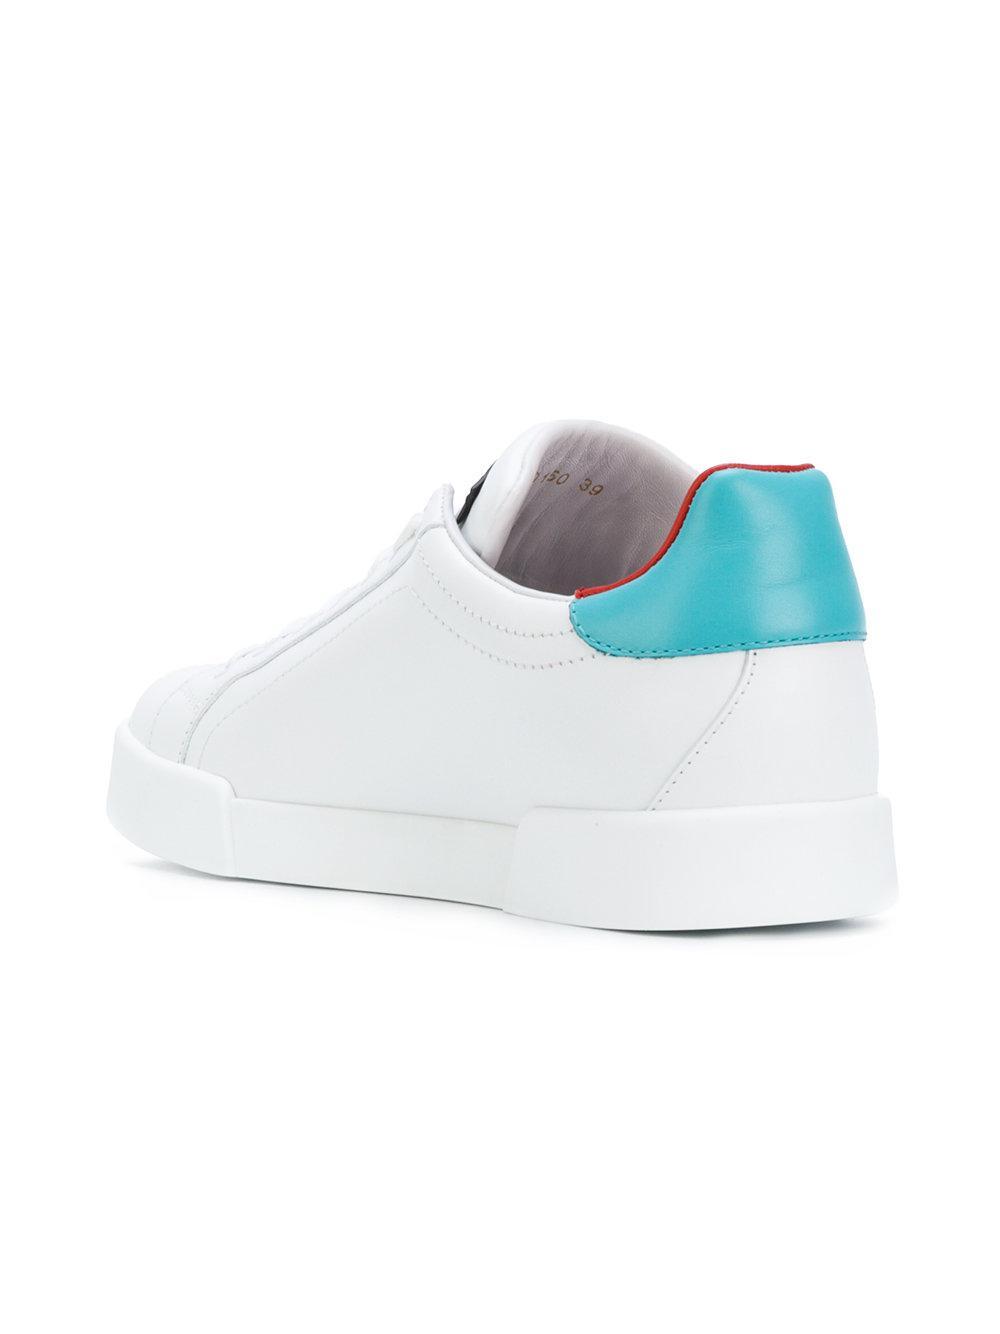 Dolce & Gabbana Leather Appliqué Logo Heart Sneakers in White